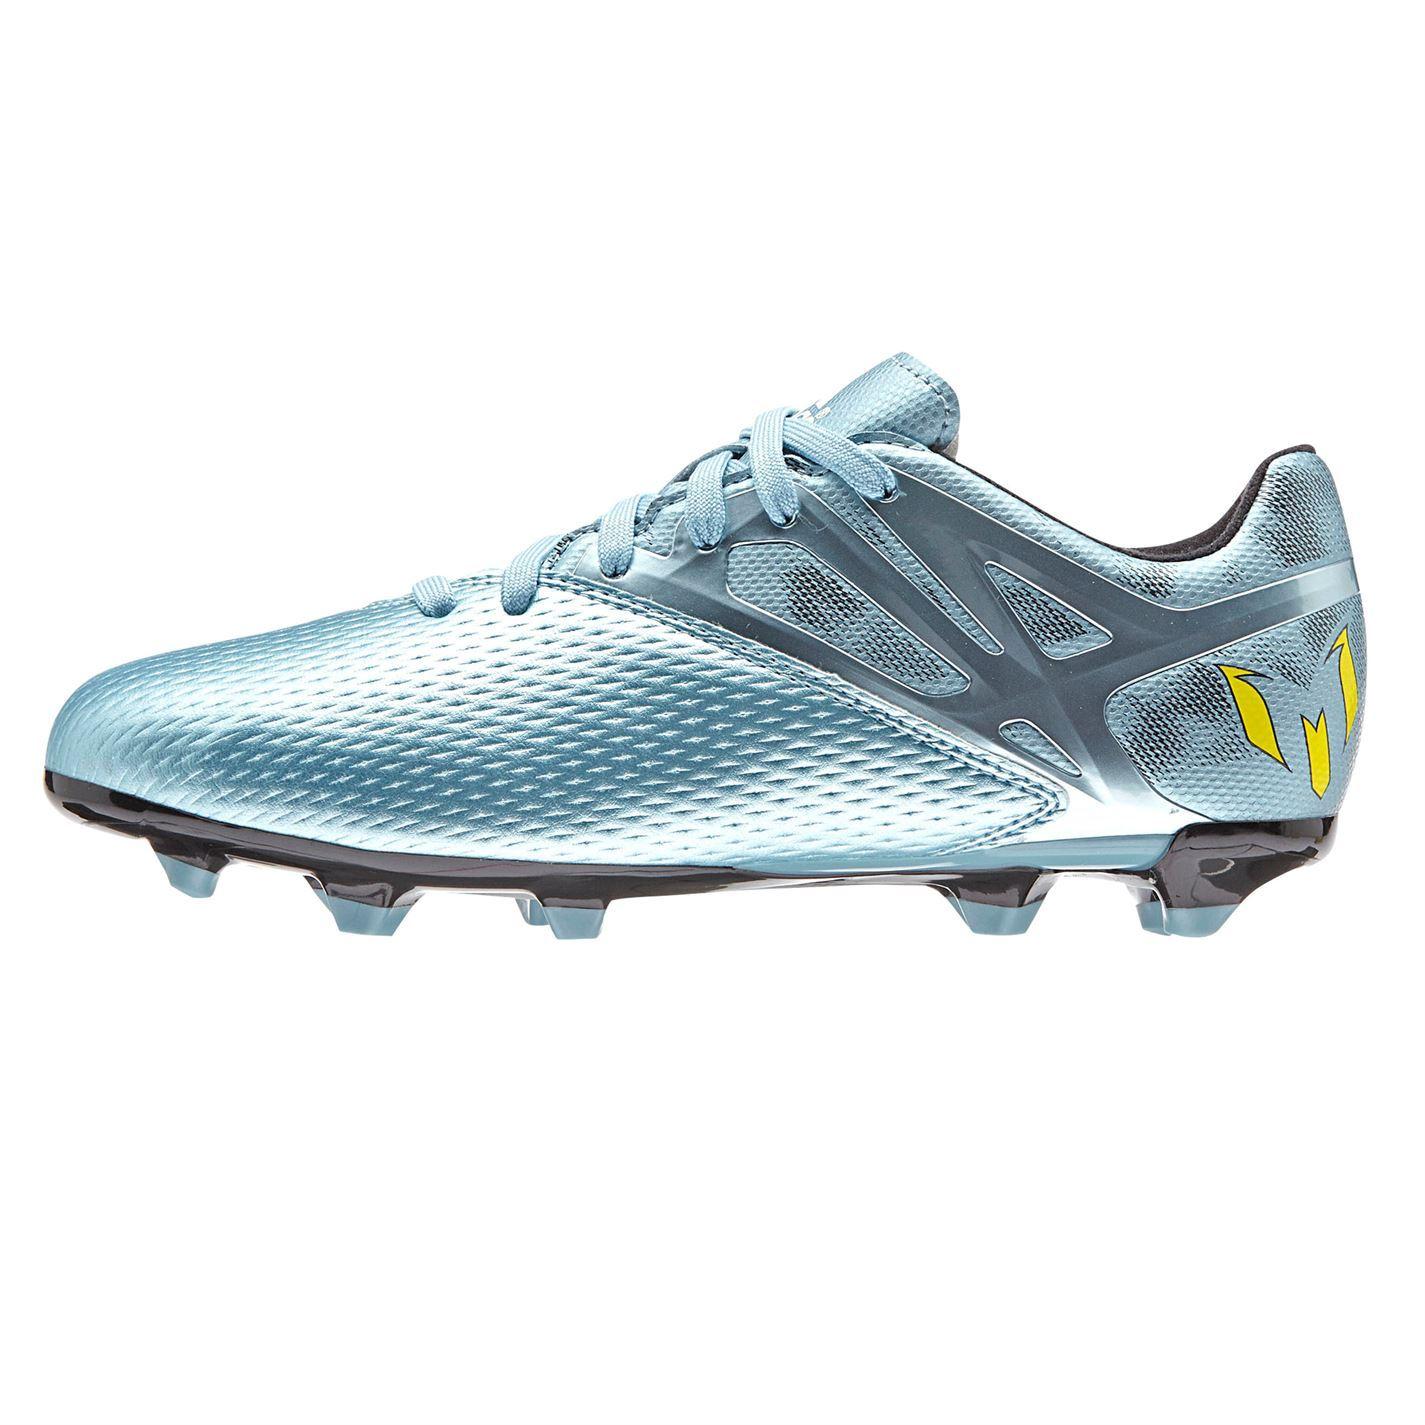 adidas messi 15.3 fg childrens football boots